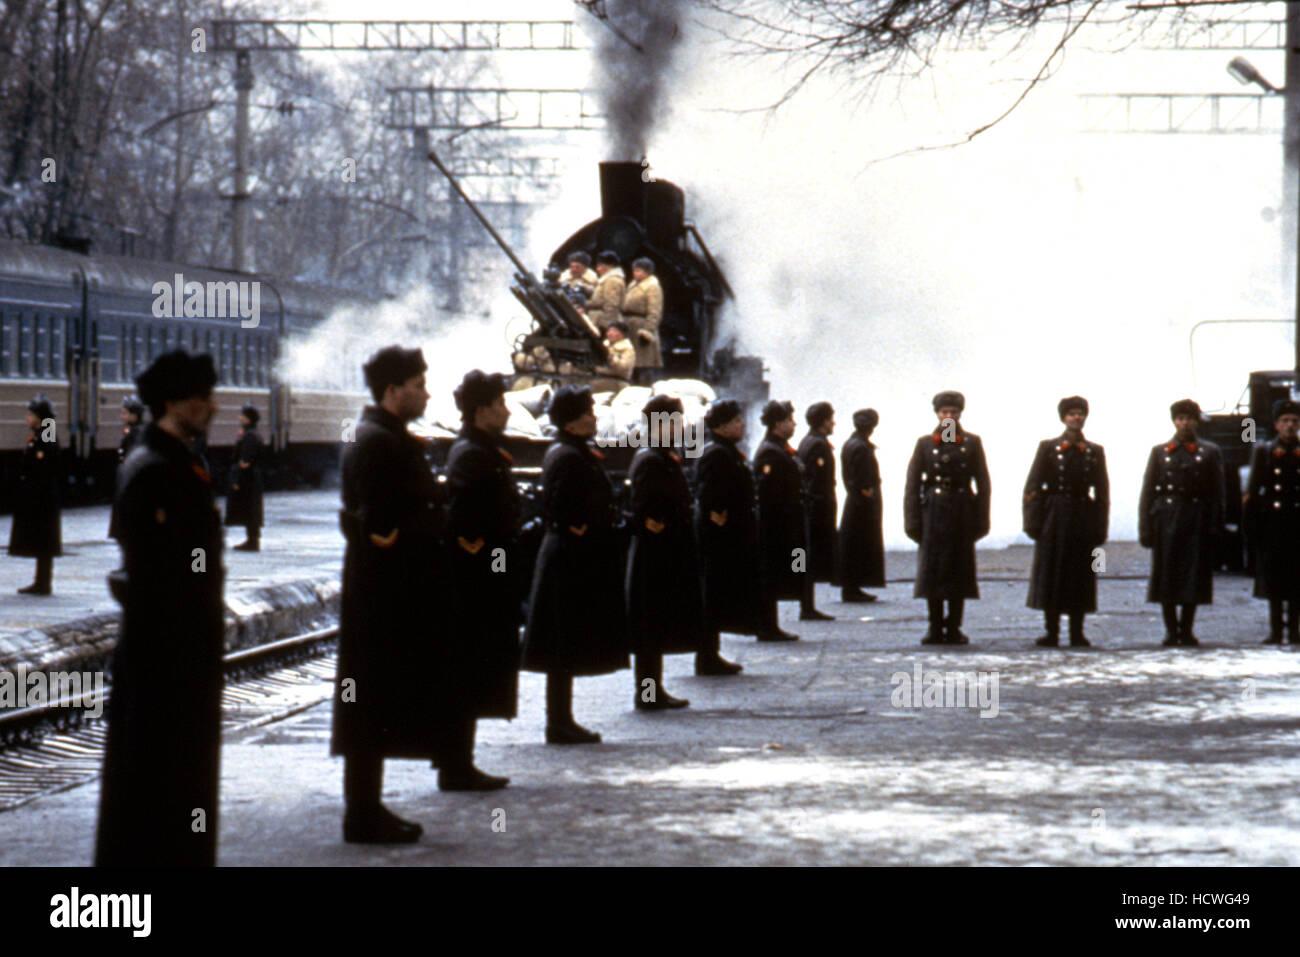 THE INNER CIRCLE, 1991, (c) Columbia Bilder/Courtesy Everett Collection Stockfoto